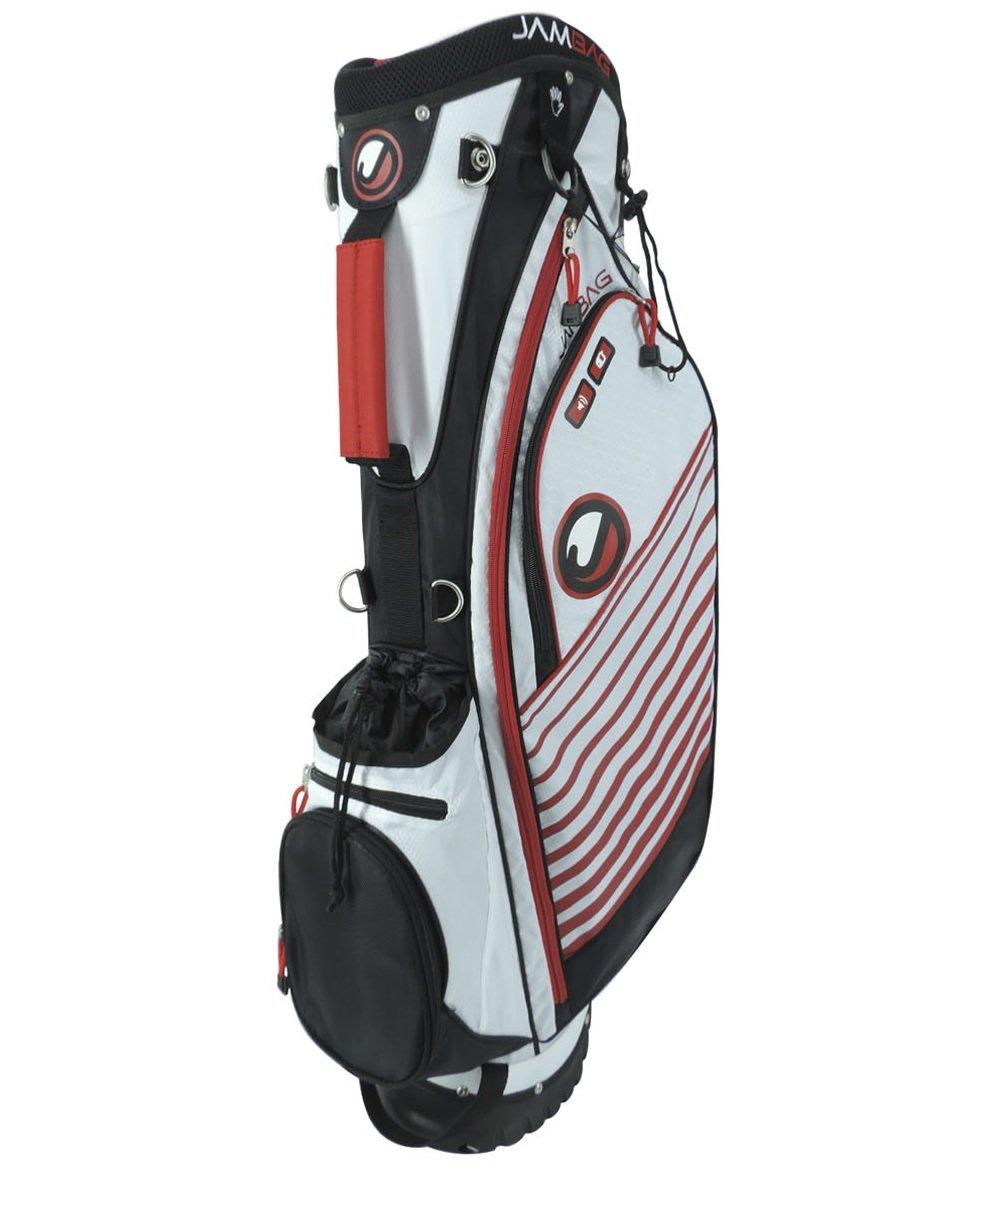 Orlimar 2015 OJam Vibeゴルフスタンドバッグ、ホワイト/ブラック/レッド   B00UD6B8QQ